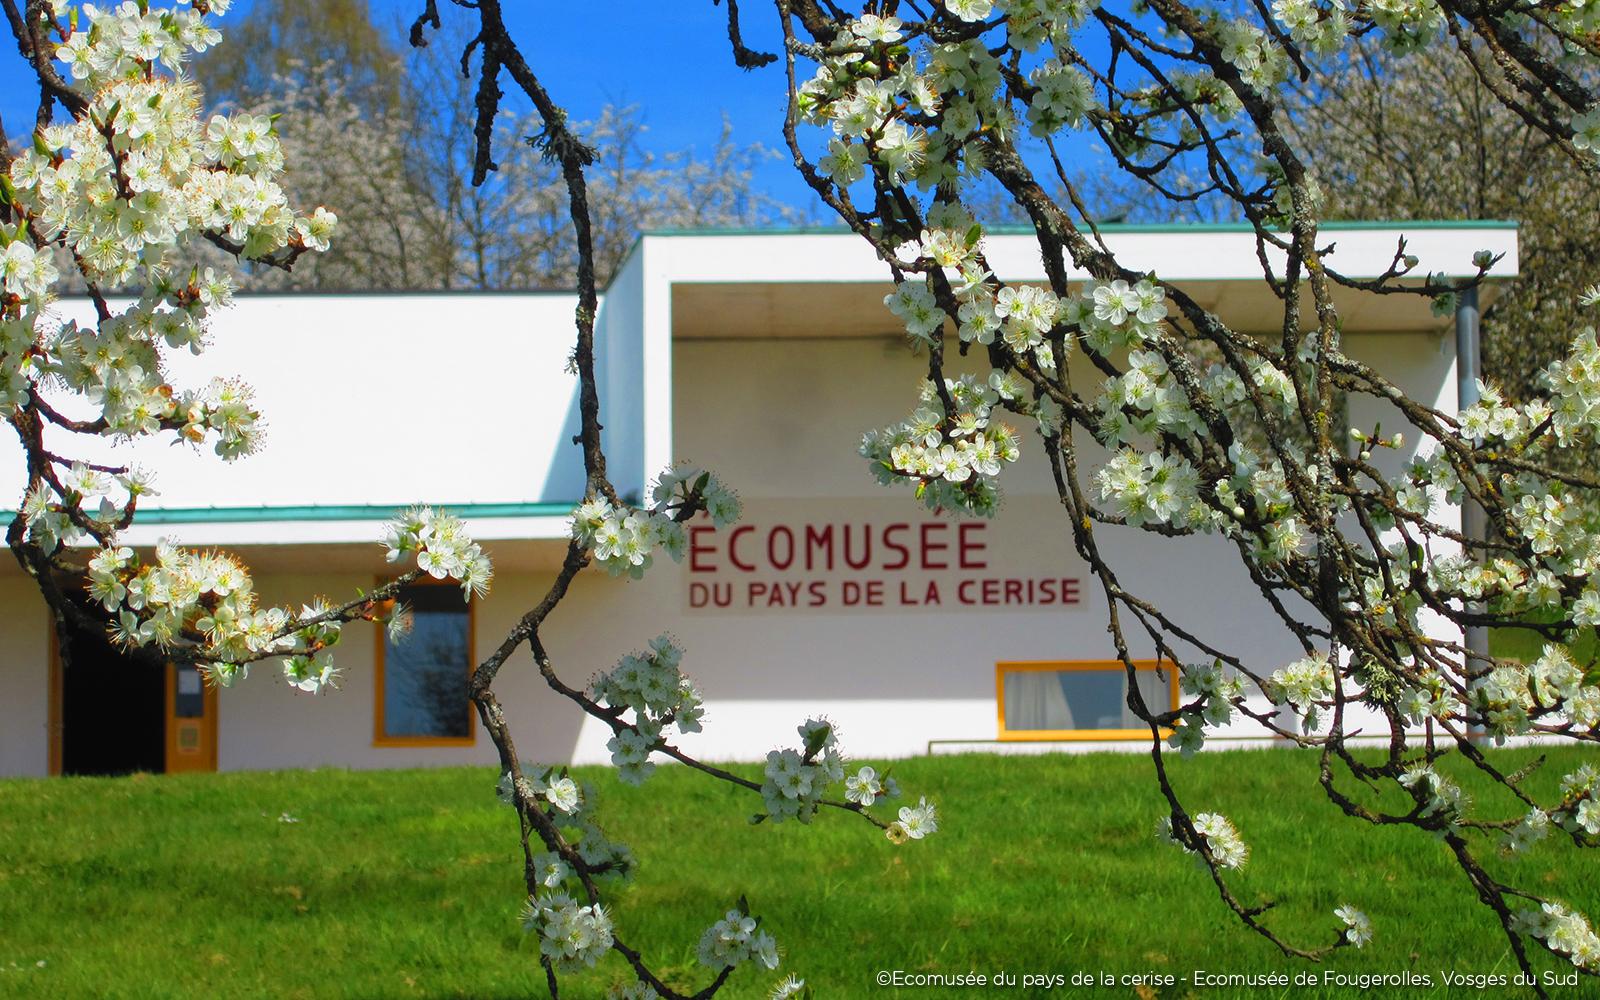 Ecomusee-de-Fougerolles-entree